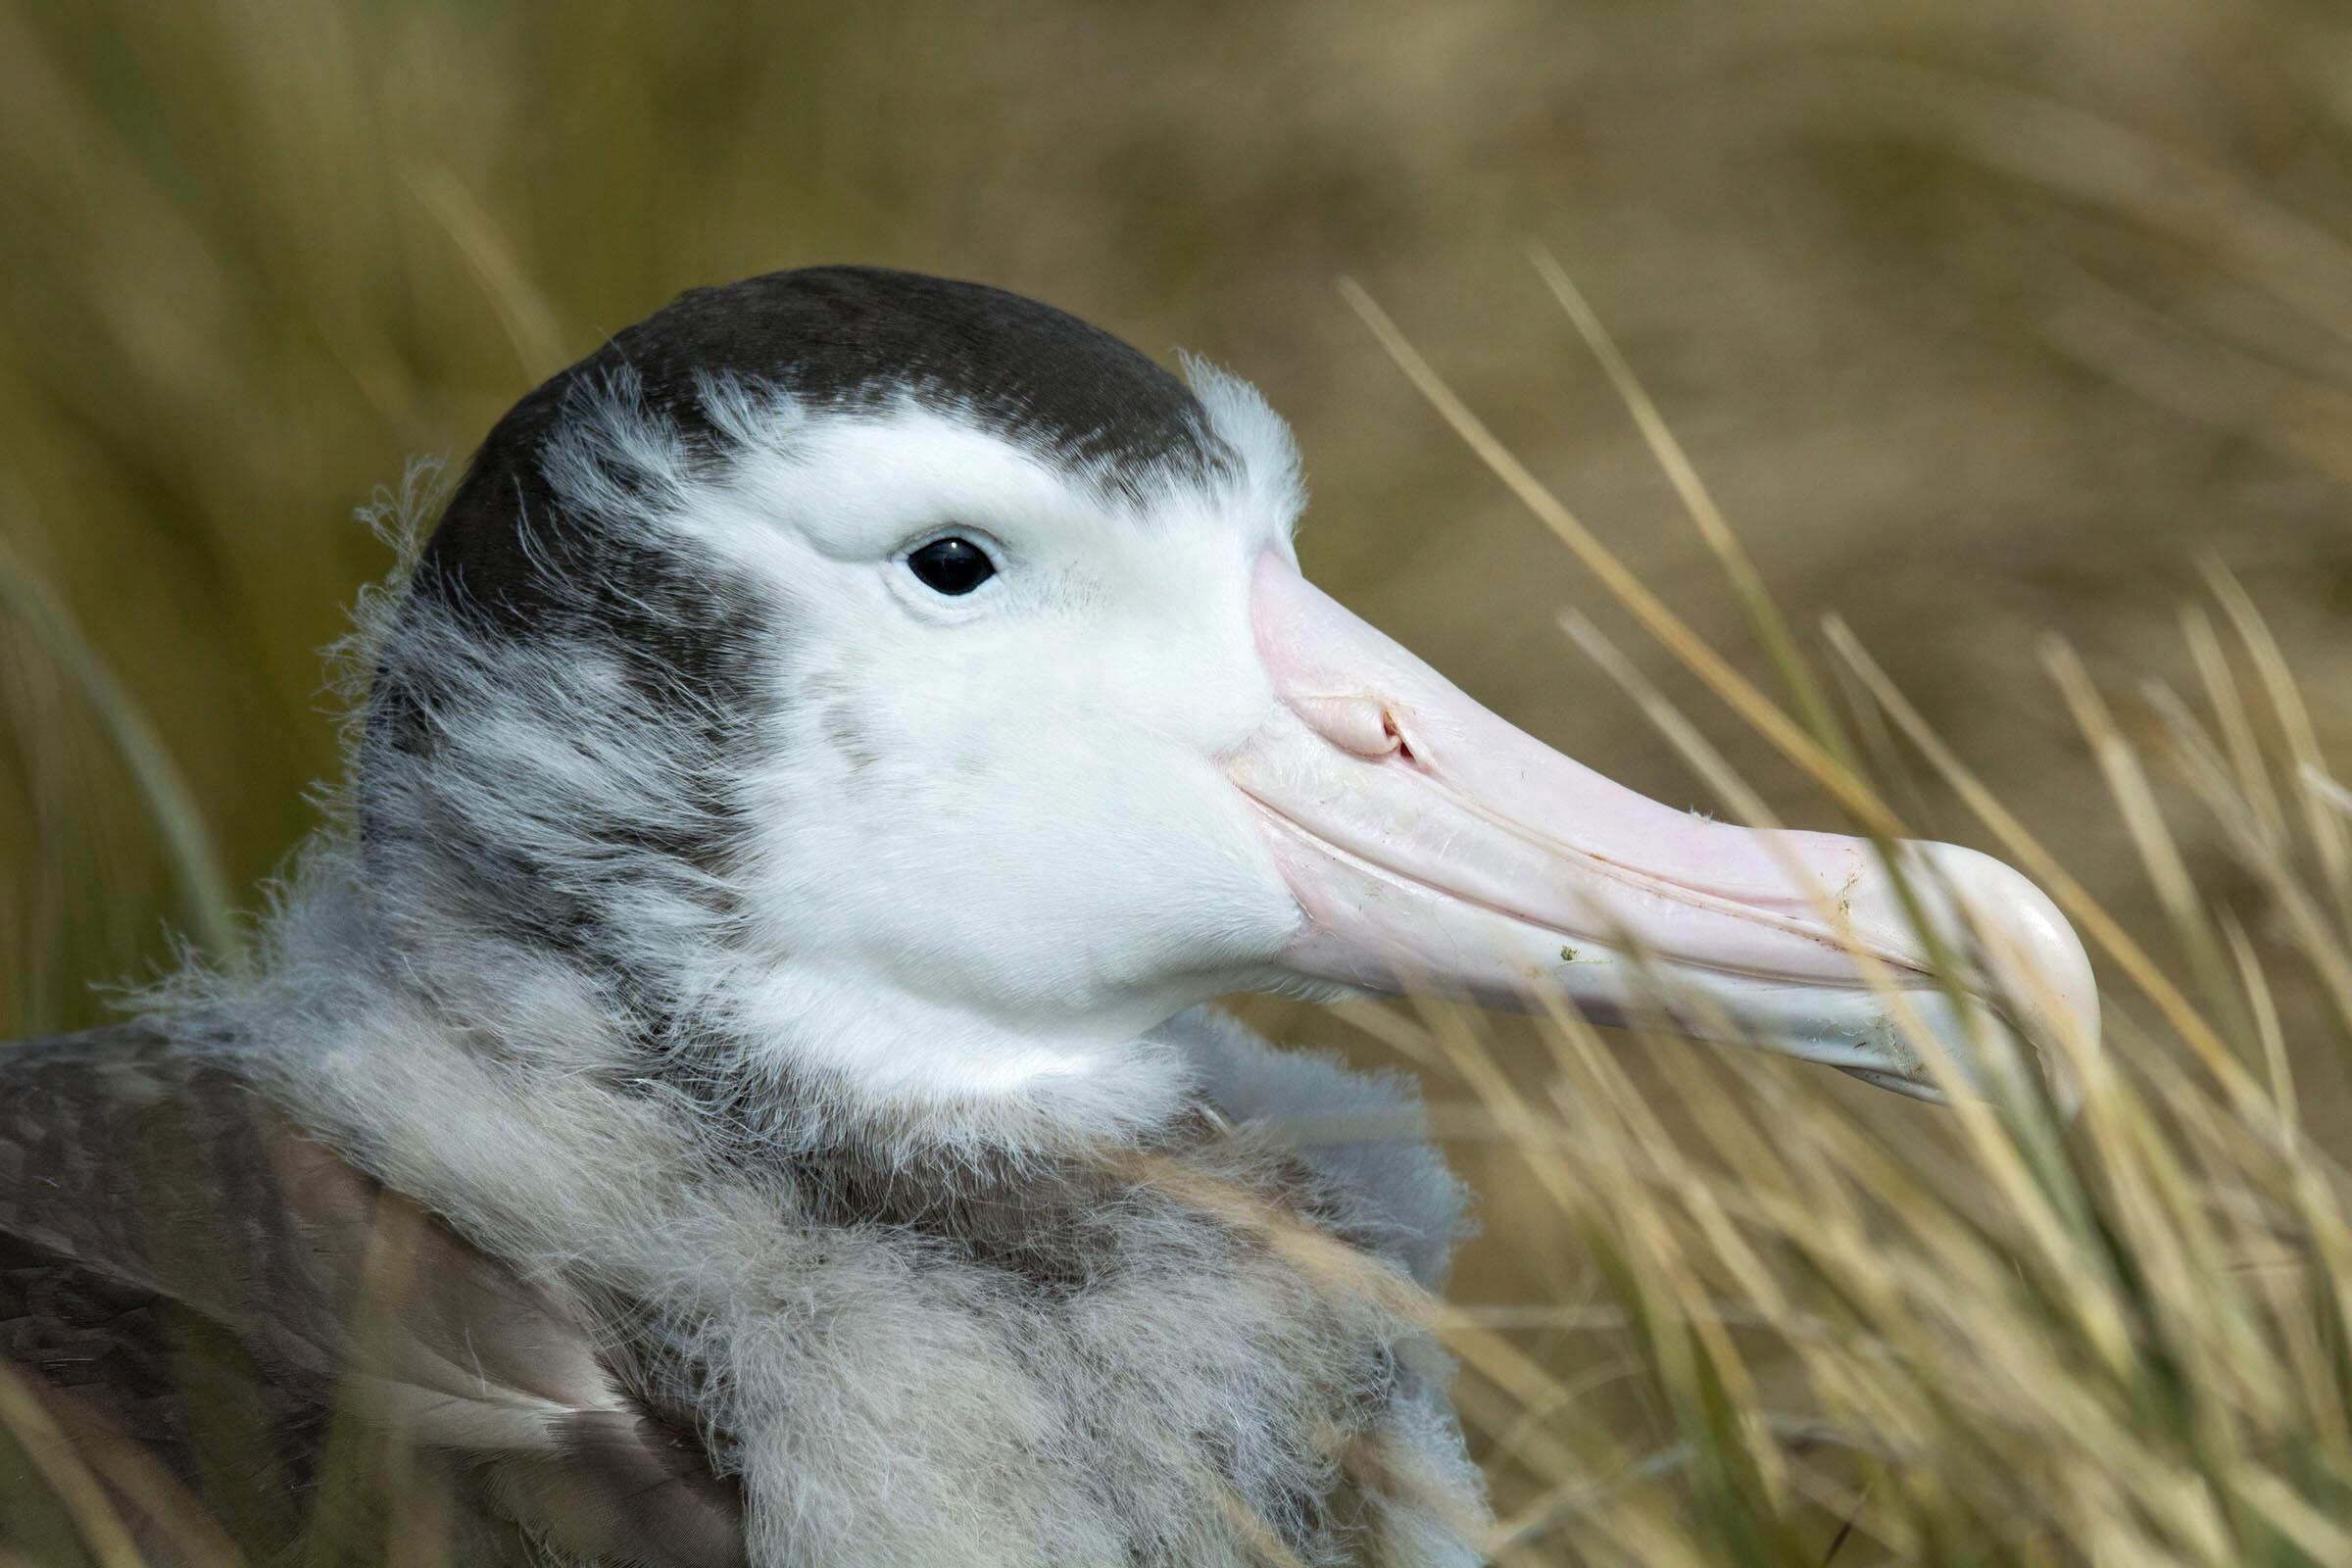 Wandering Albatross/Amateur Category. Debra Herst/Audubon Photography Awards